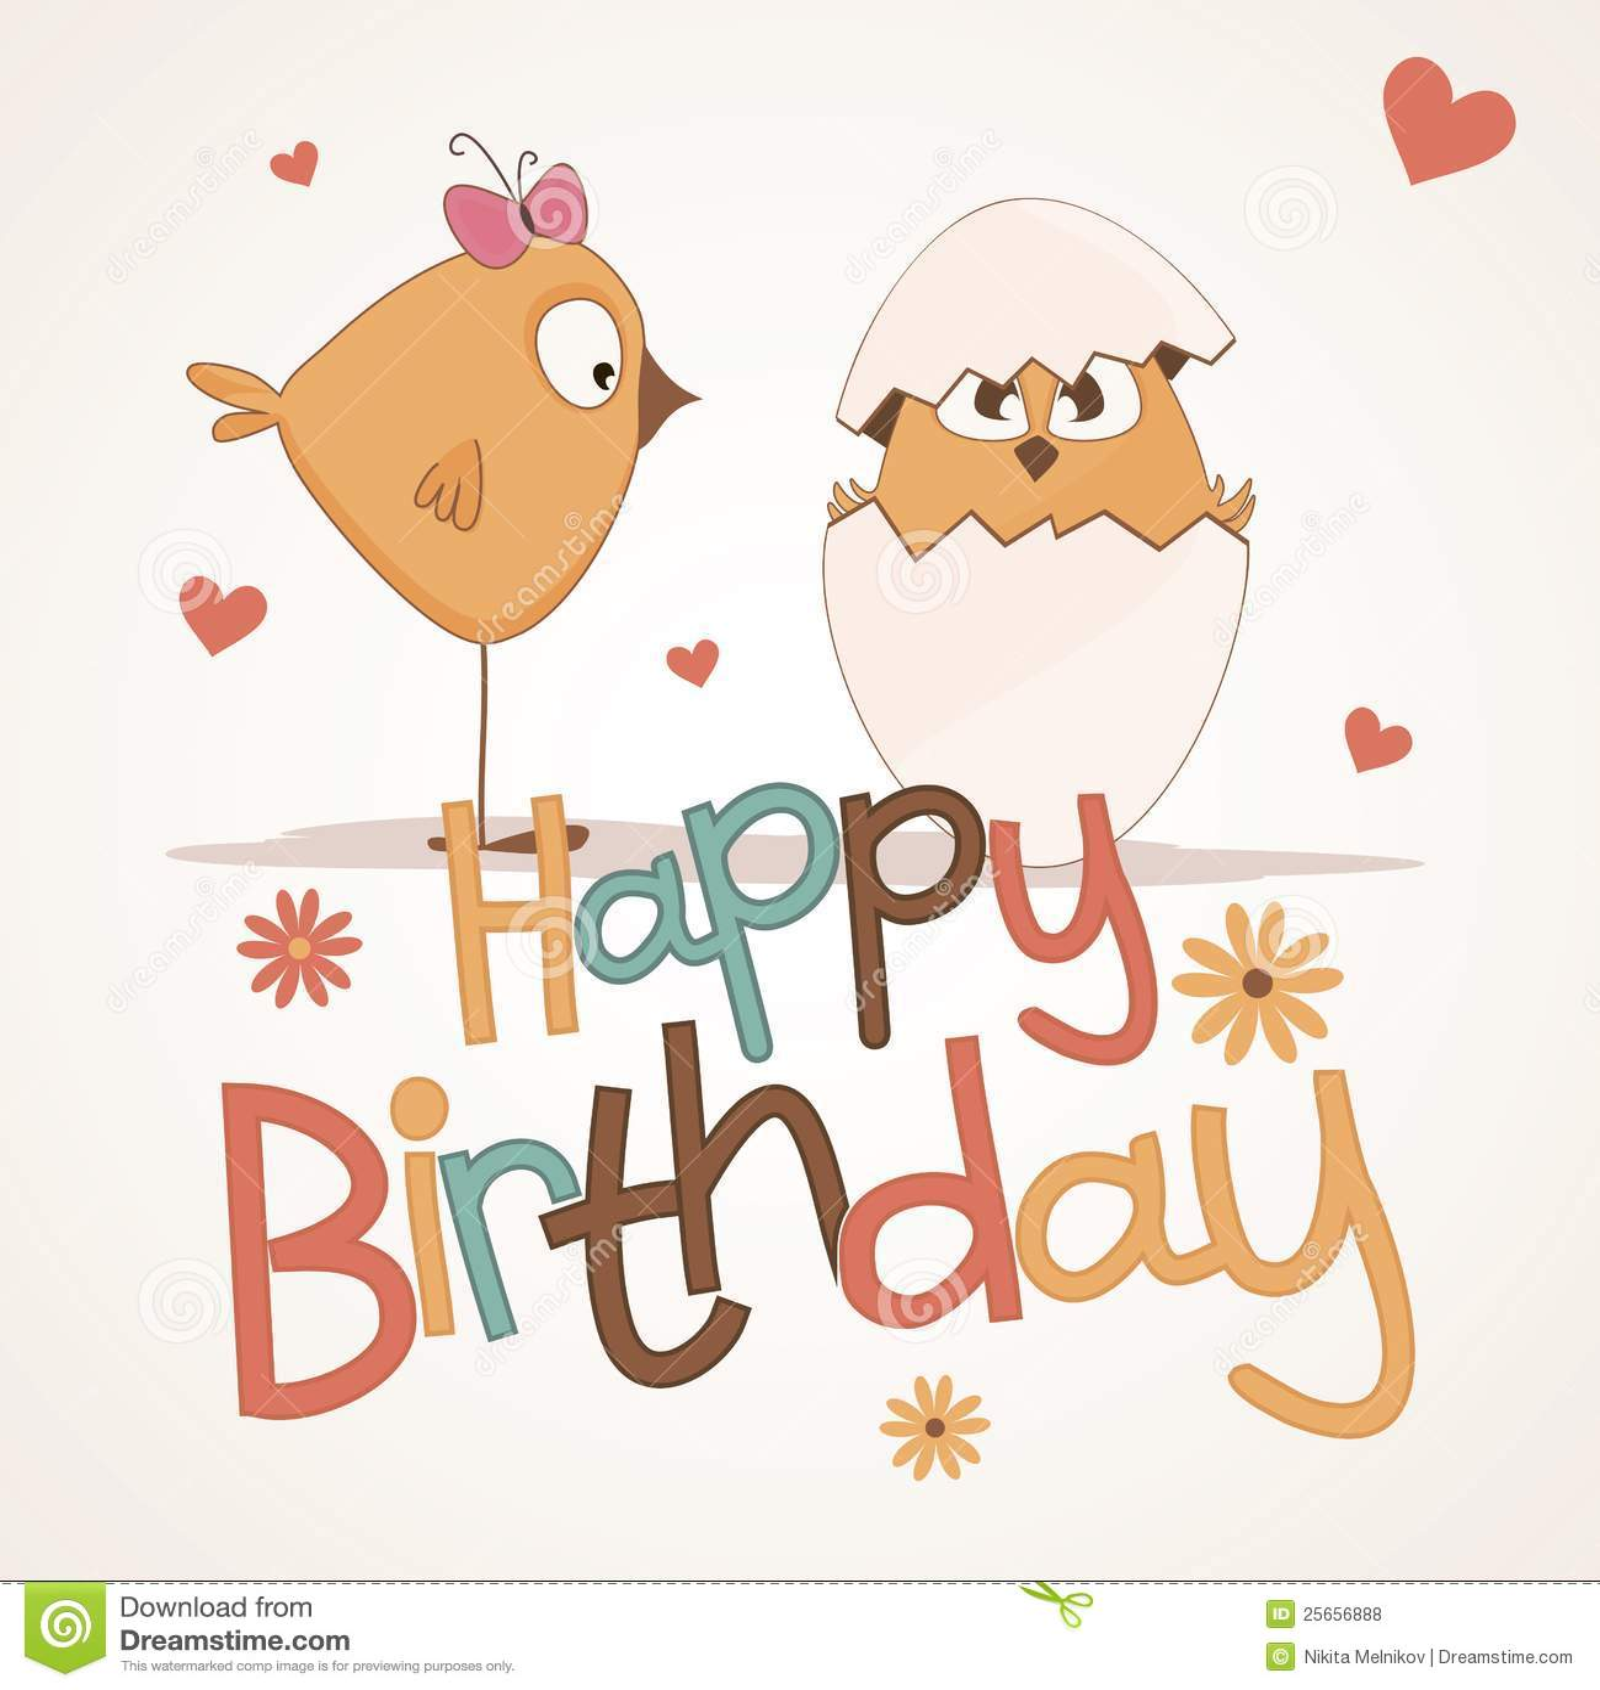 Cute Happy Birthday Card Royalty Free Stock Photos